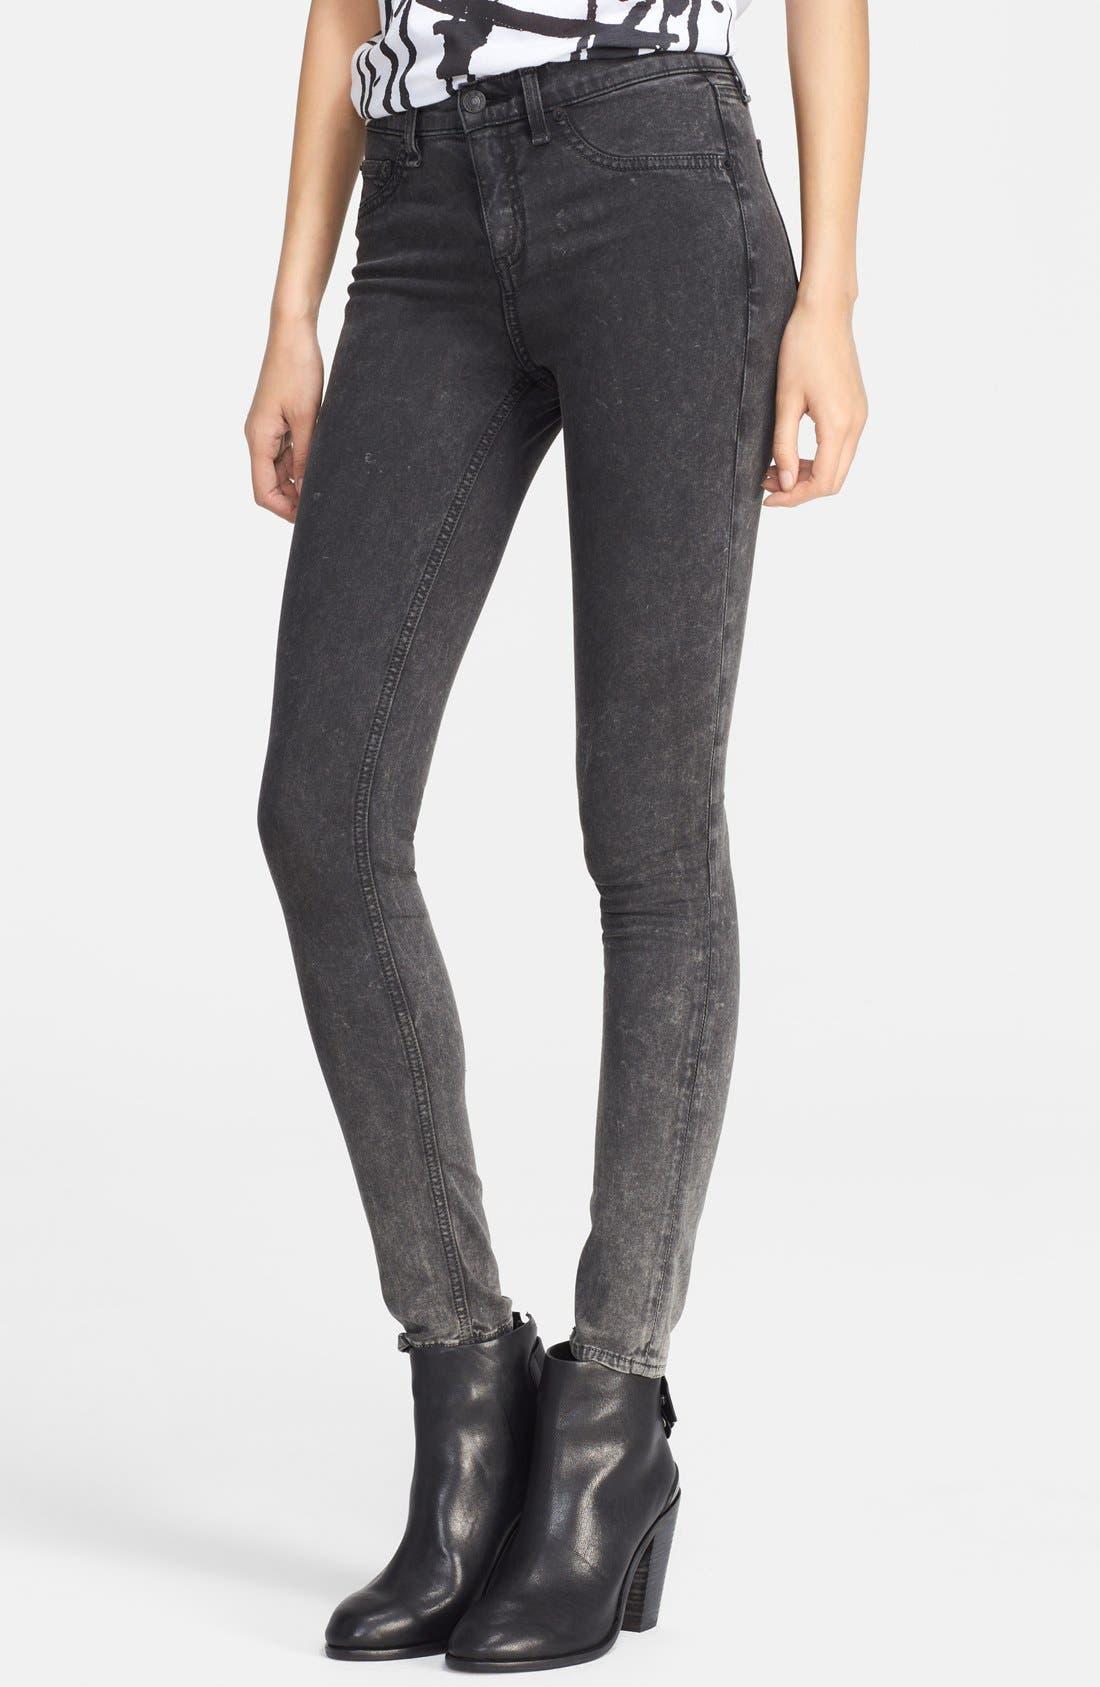 Alternate Image 1 Selected - rag & bone/JEAN 'Justine' High Rise Skinny Jeans (Rosebowl Black)